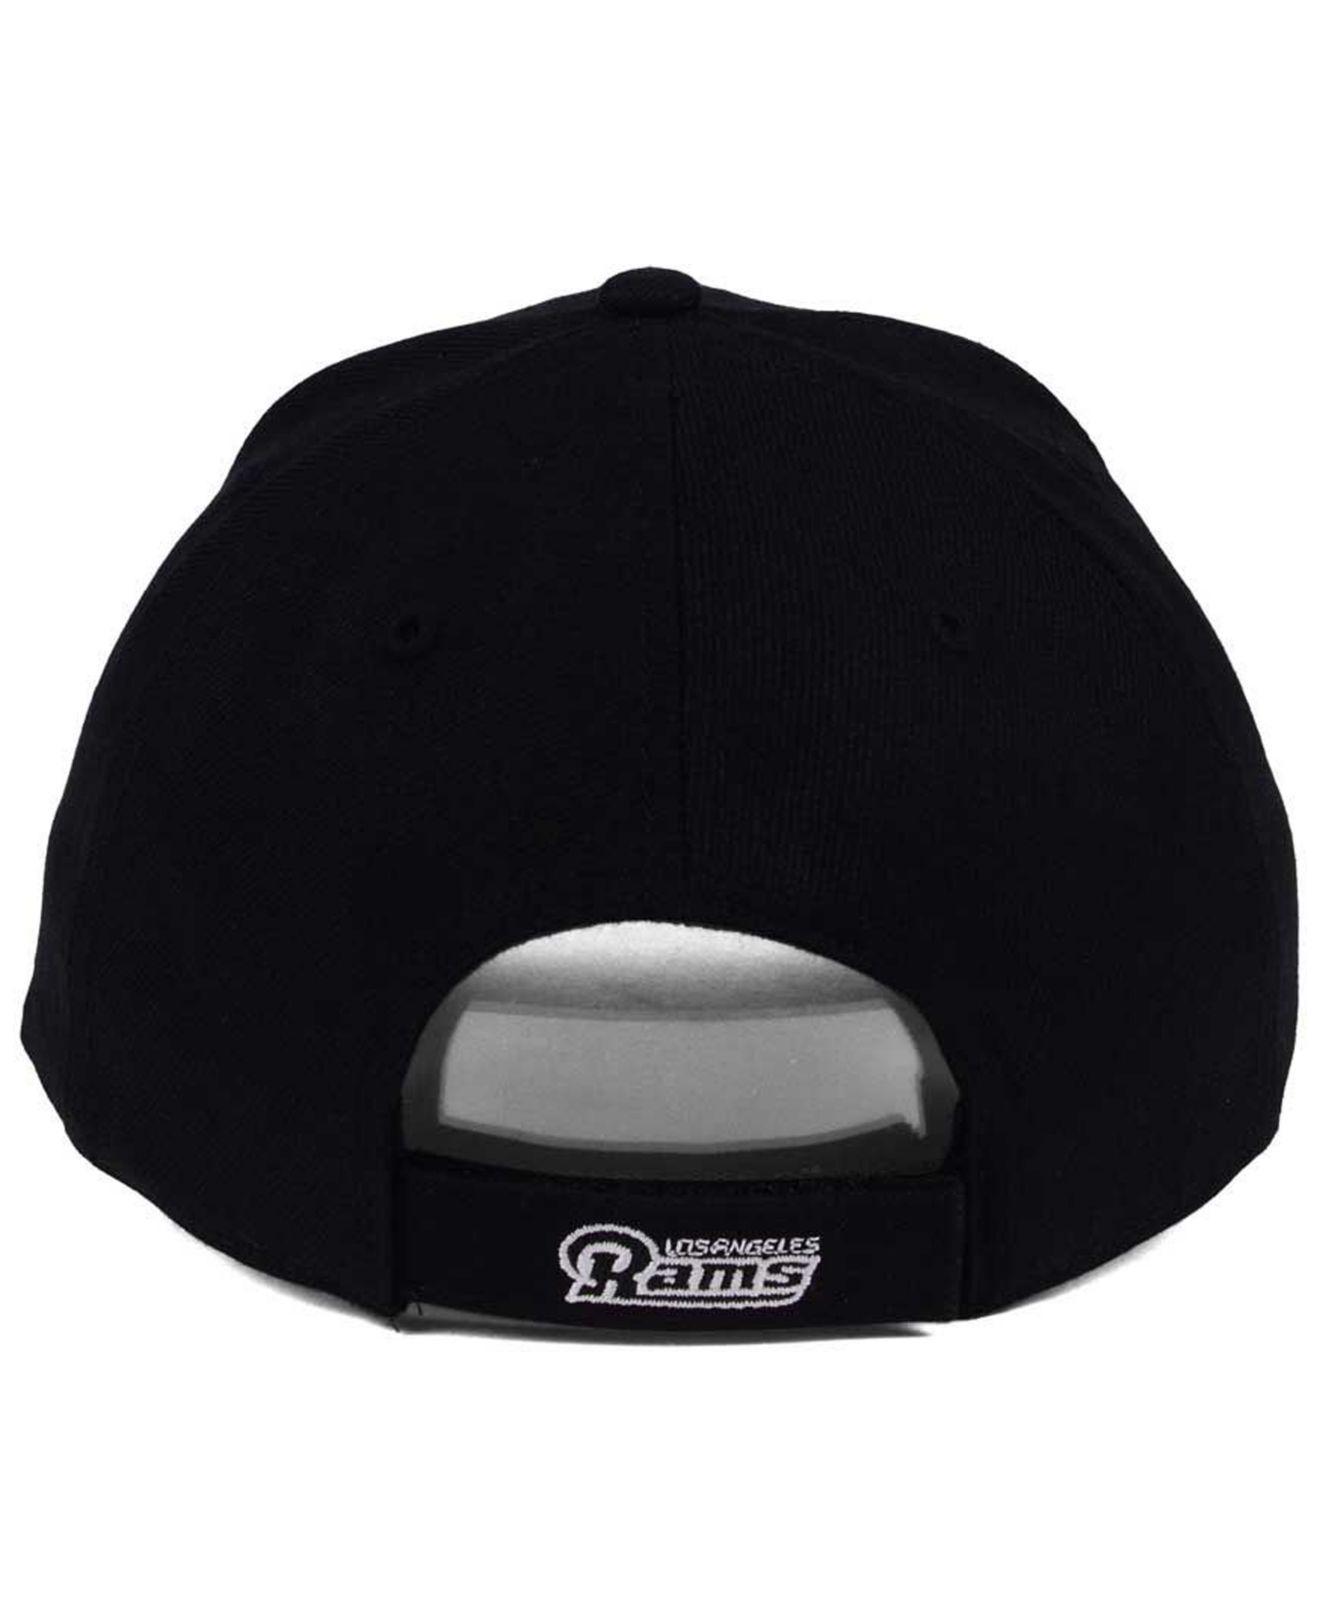 Lyst - 47 Brand Los Angeles Rams Overrun Mvp Cap in Black for Men e4850b28dab8